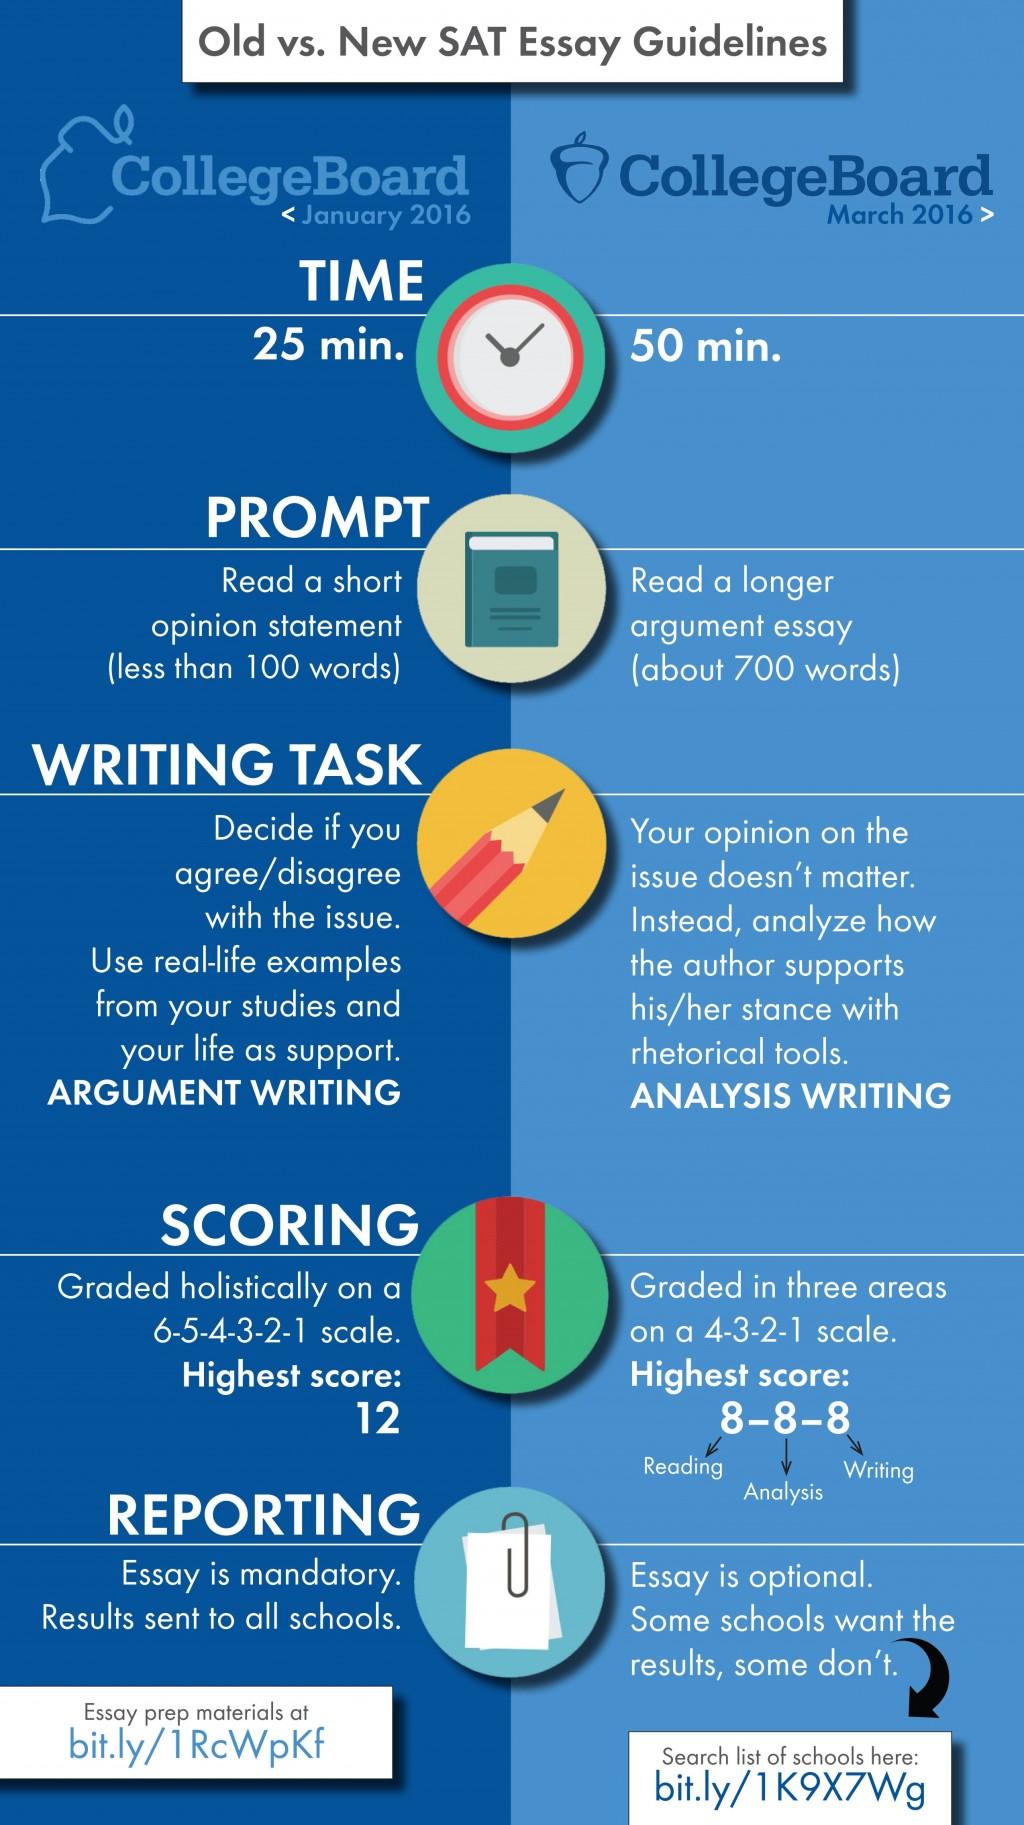 016 Sat Essay Tips Example Singular Pdf Writing Prepscholar Large